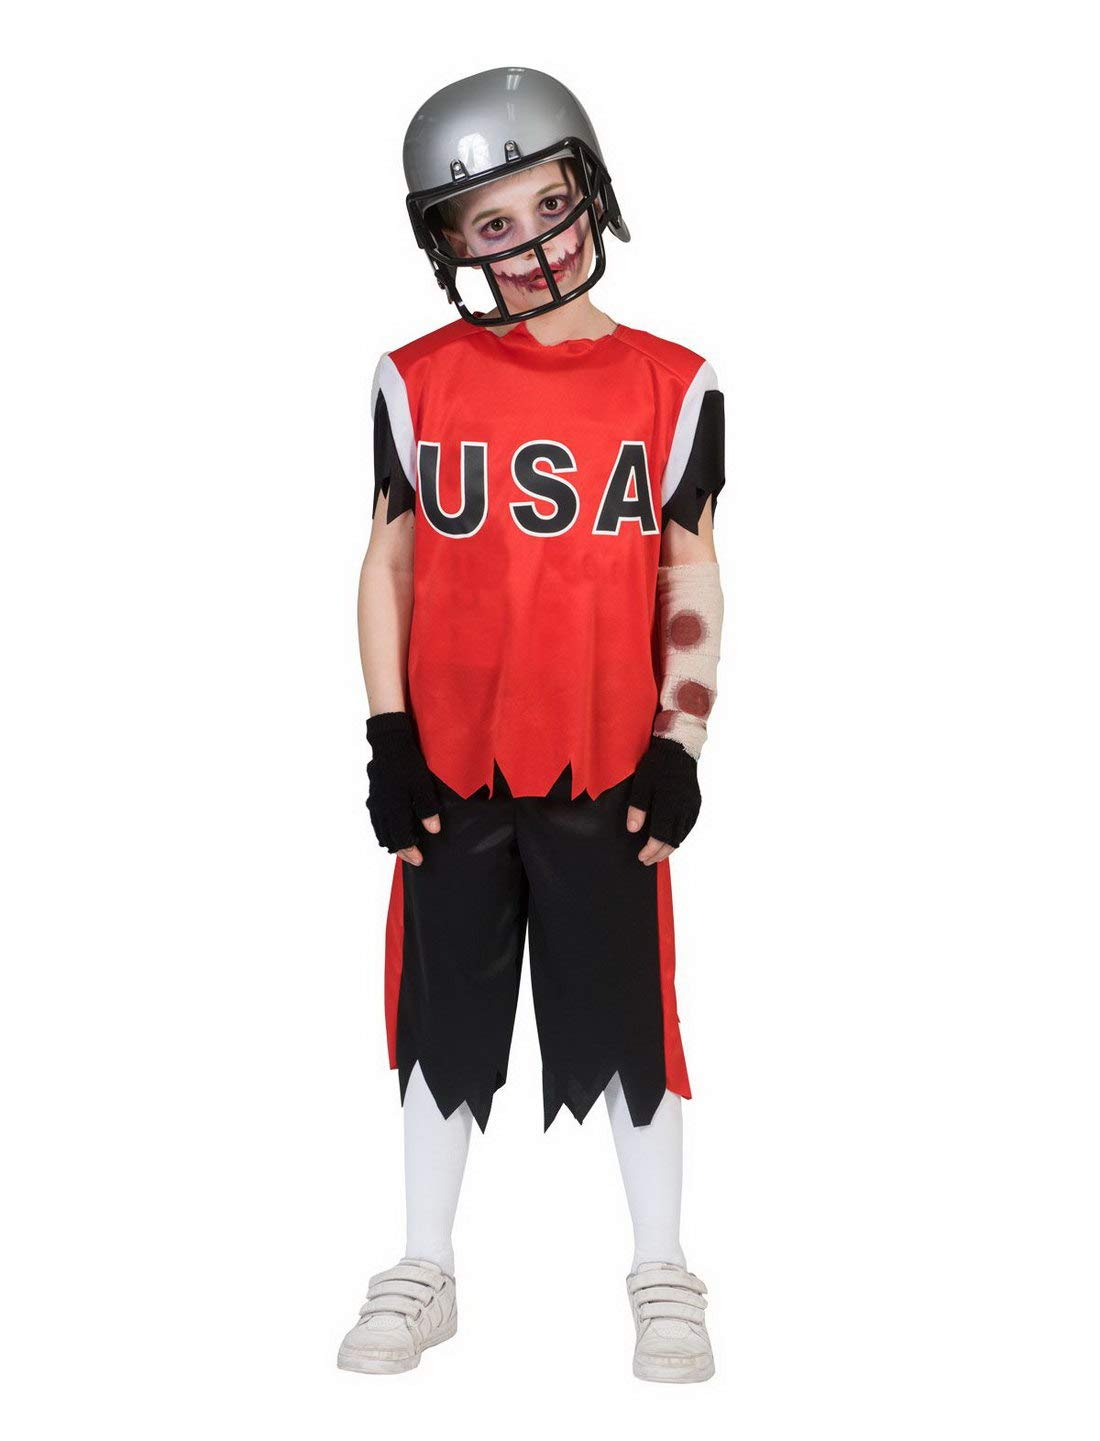 costumebakery - Disfraz Infantil, Zombie American fott Baller ...